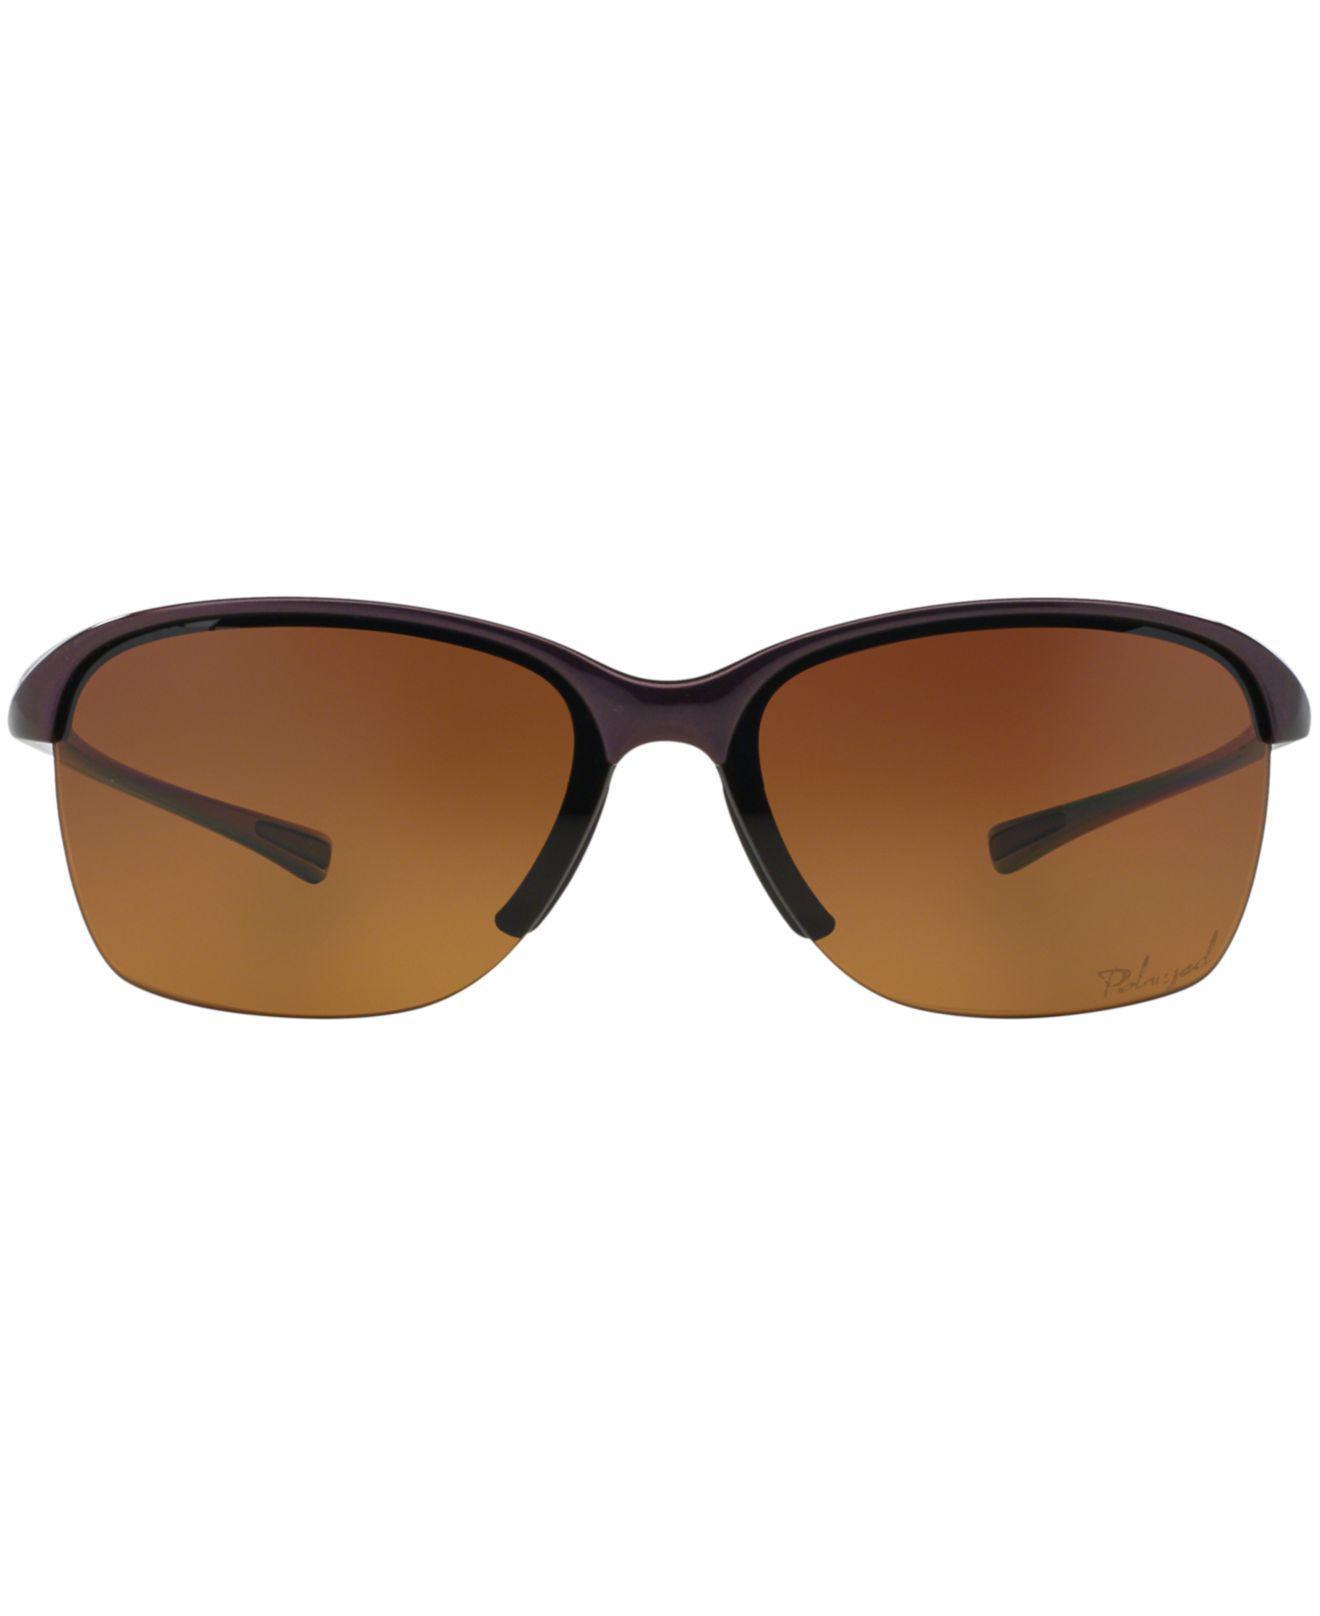 606ea5e65ab Lyst - Oakley Women s Sunglasses